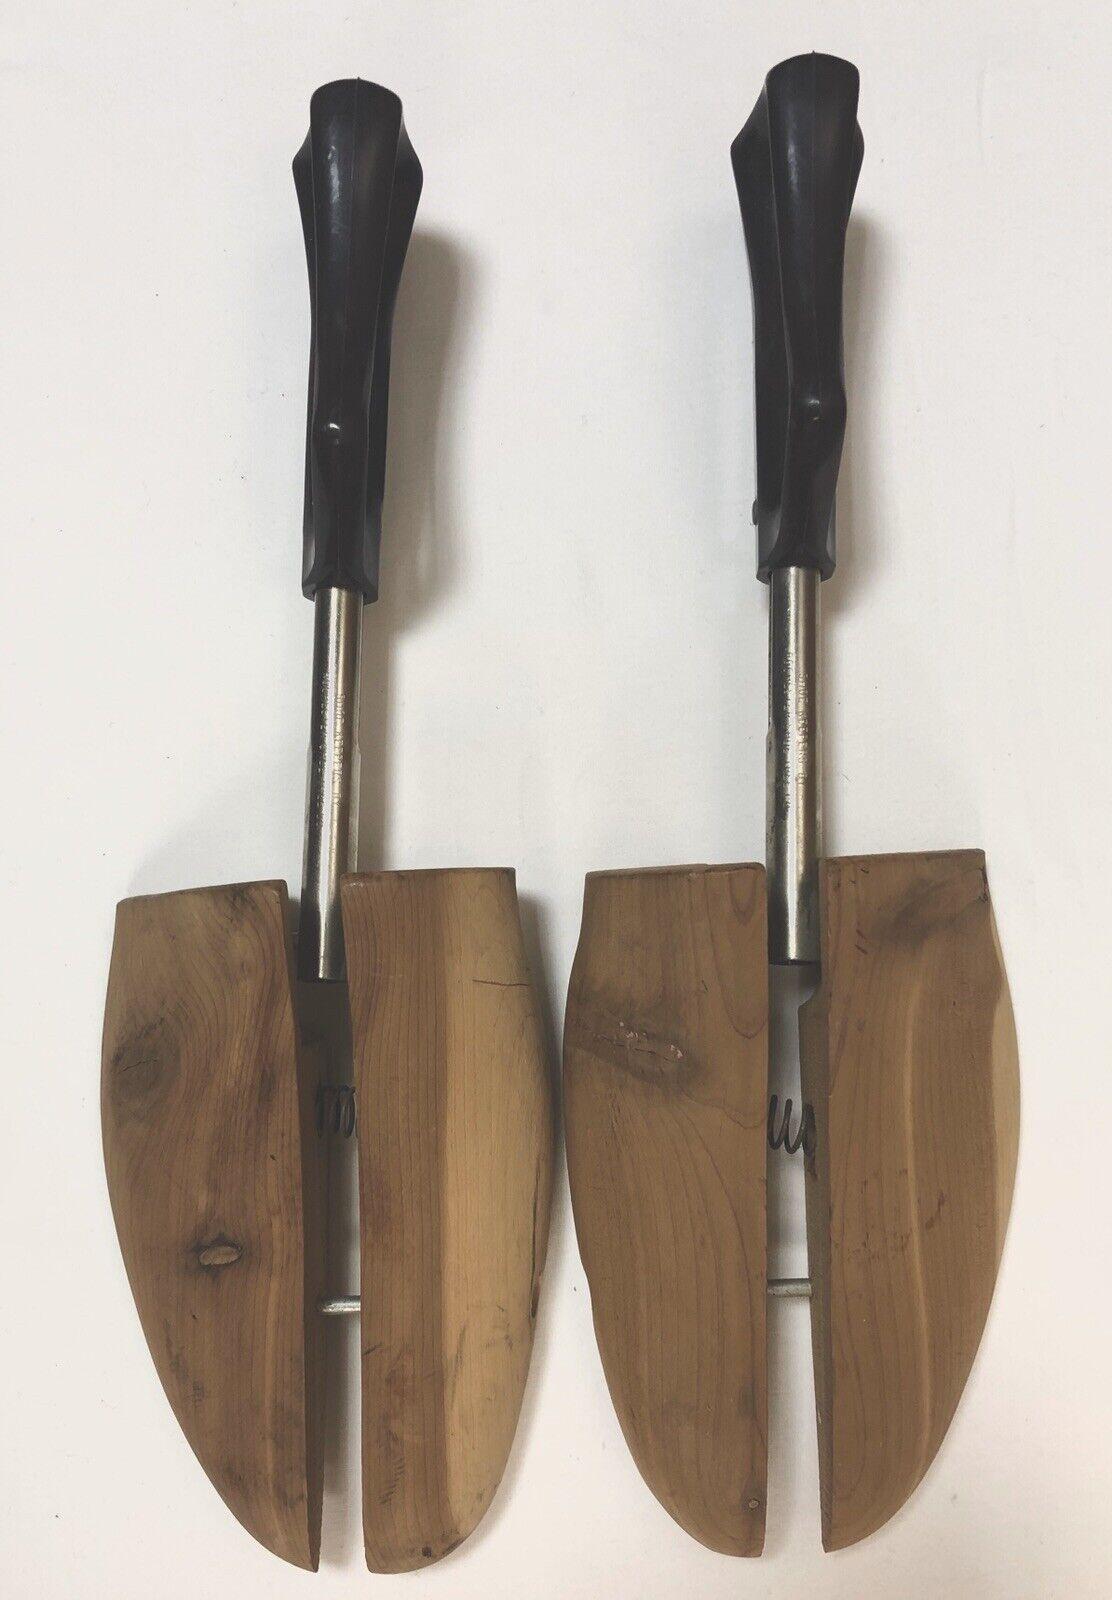 Cedar Rochester Shoe Tree Shoe Saver Adjustable Wooden; fits Large size shoes